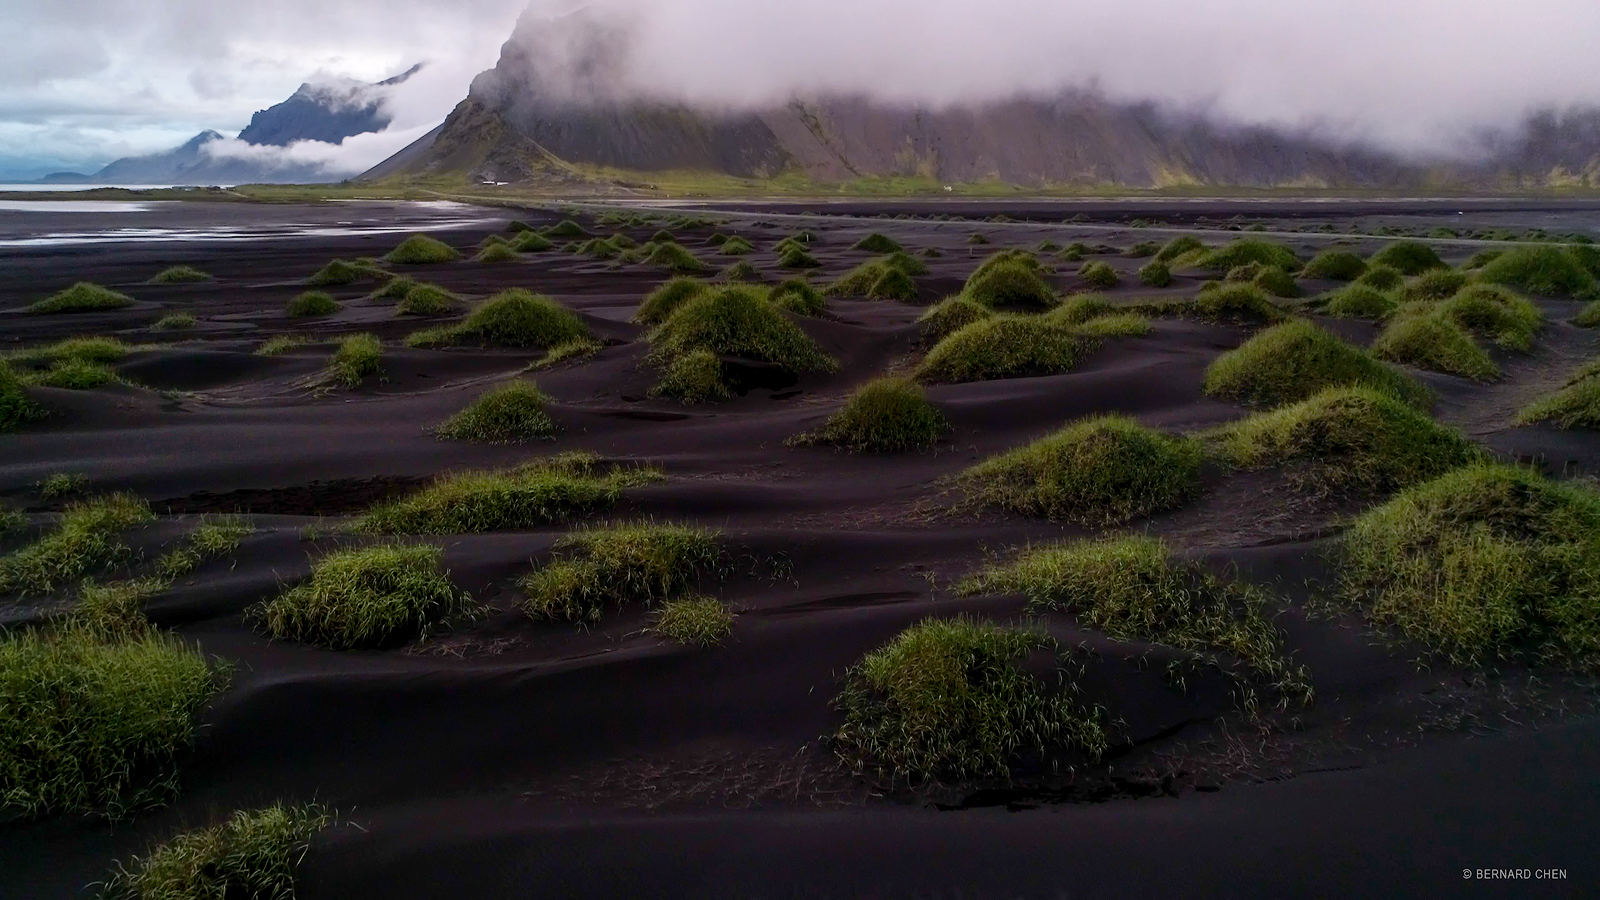 Iceland, Jokulsarlon, Vestrahorn, Ice Beach, Iceberg, Black Sand, Waves, Motion, Water Motion, Sunset, Cloudy, Bernard Chen, Timescapes, photo